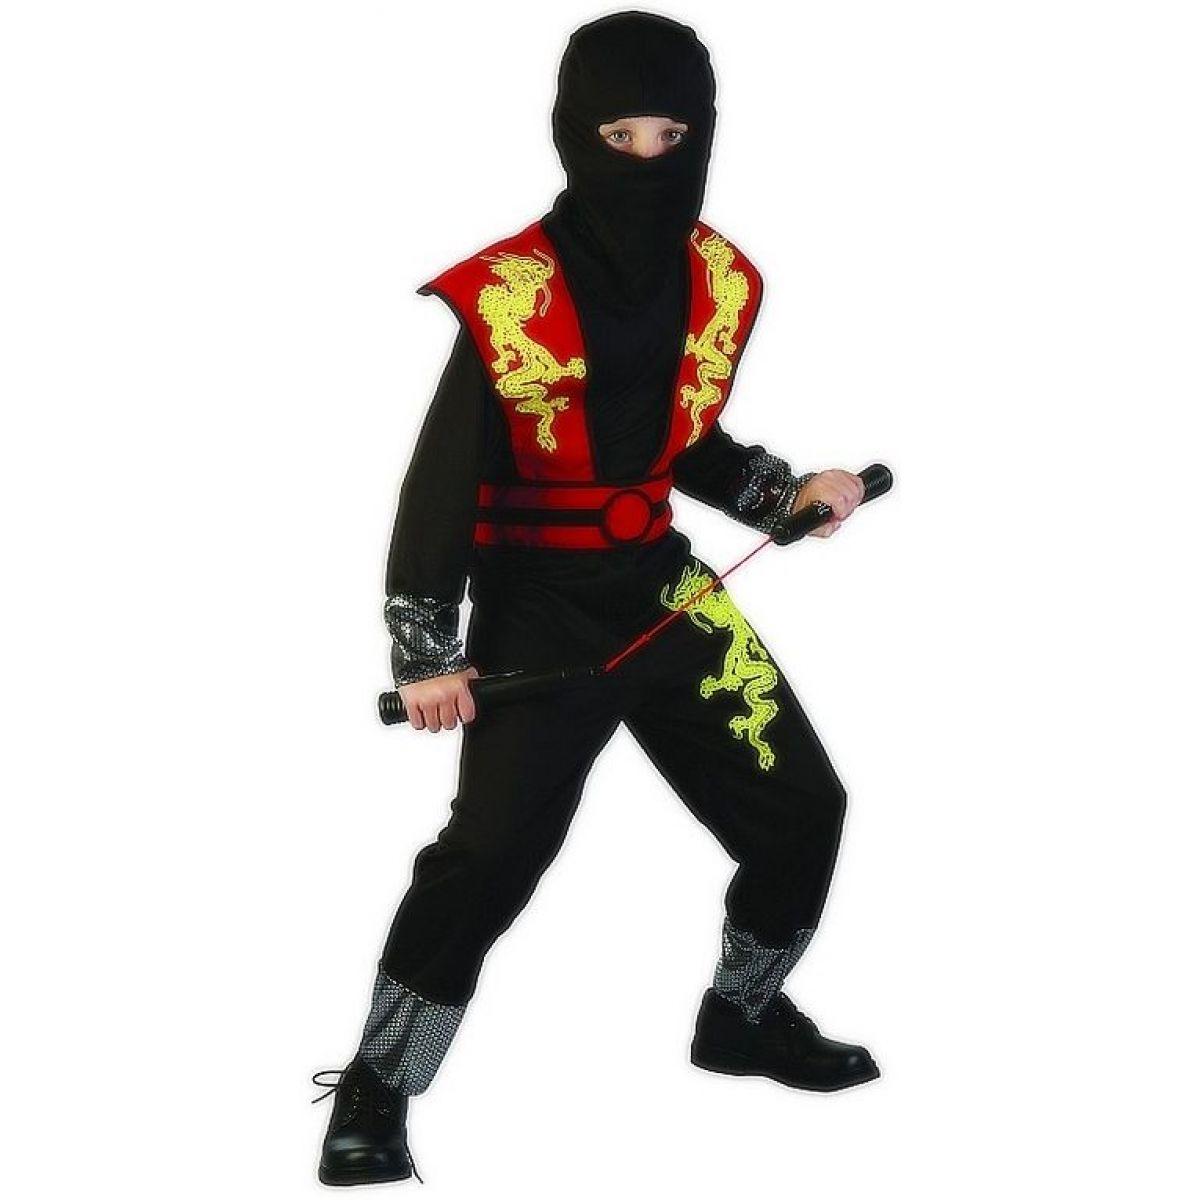 Made Dětský kostým Ninja červený 120-130 cm